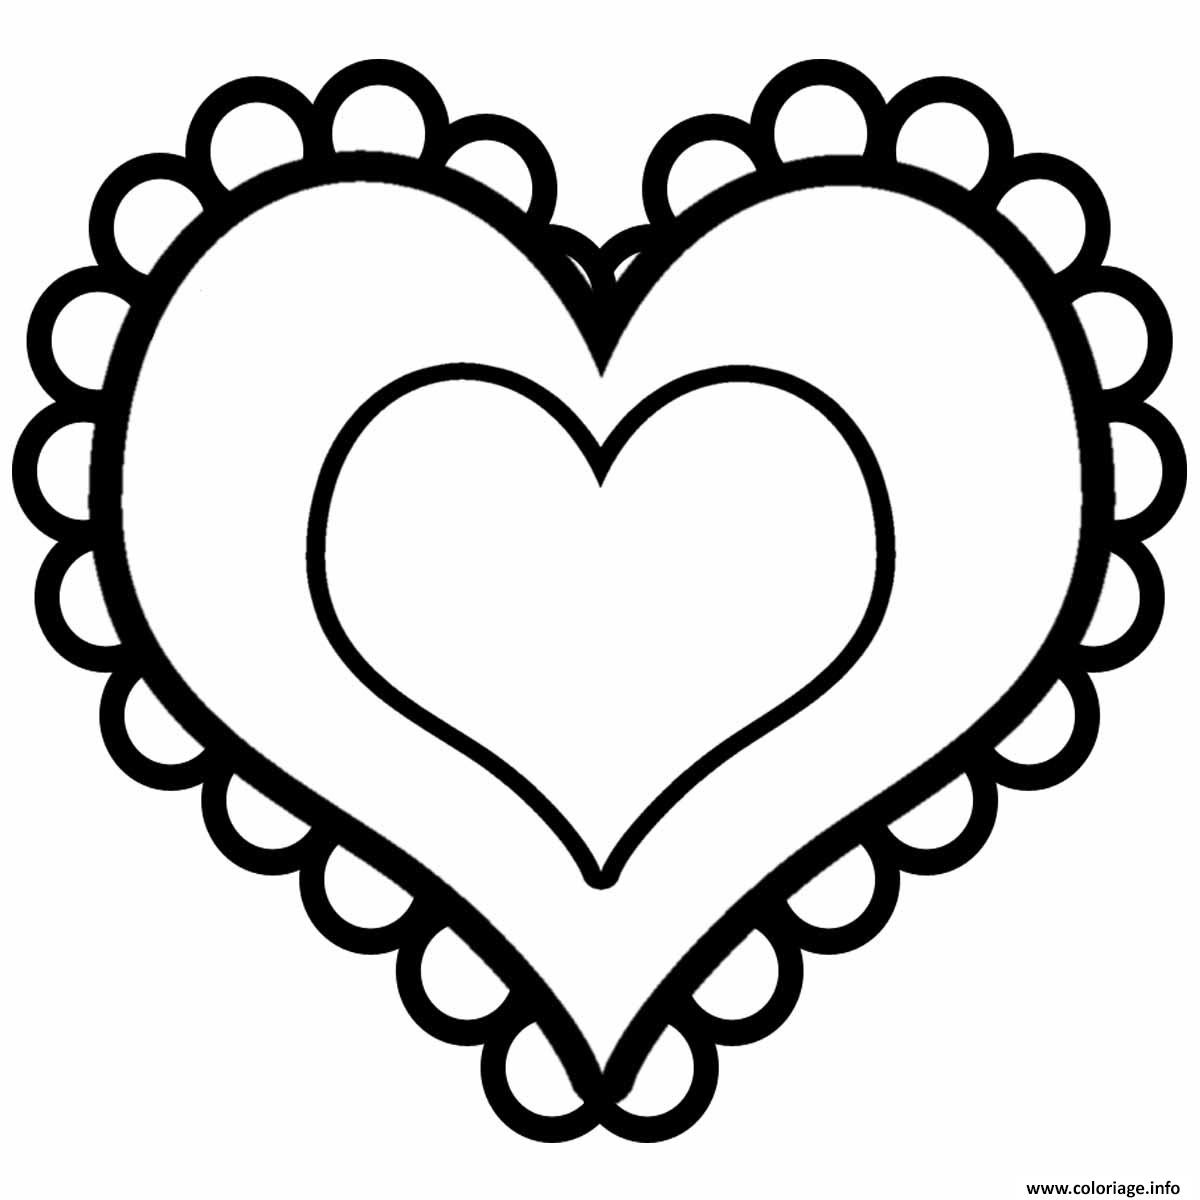 Coloriage Coeur Saint Valentin 15 Dessin  Imprimer